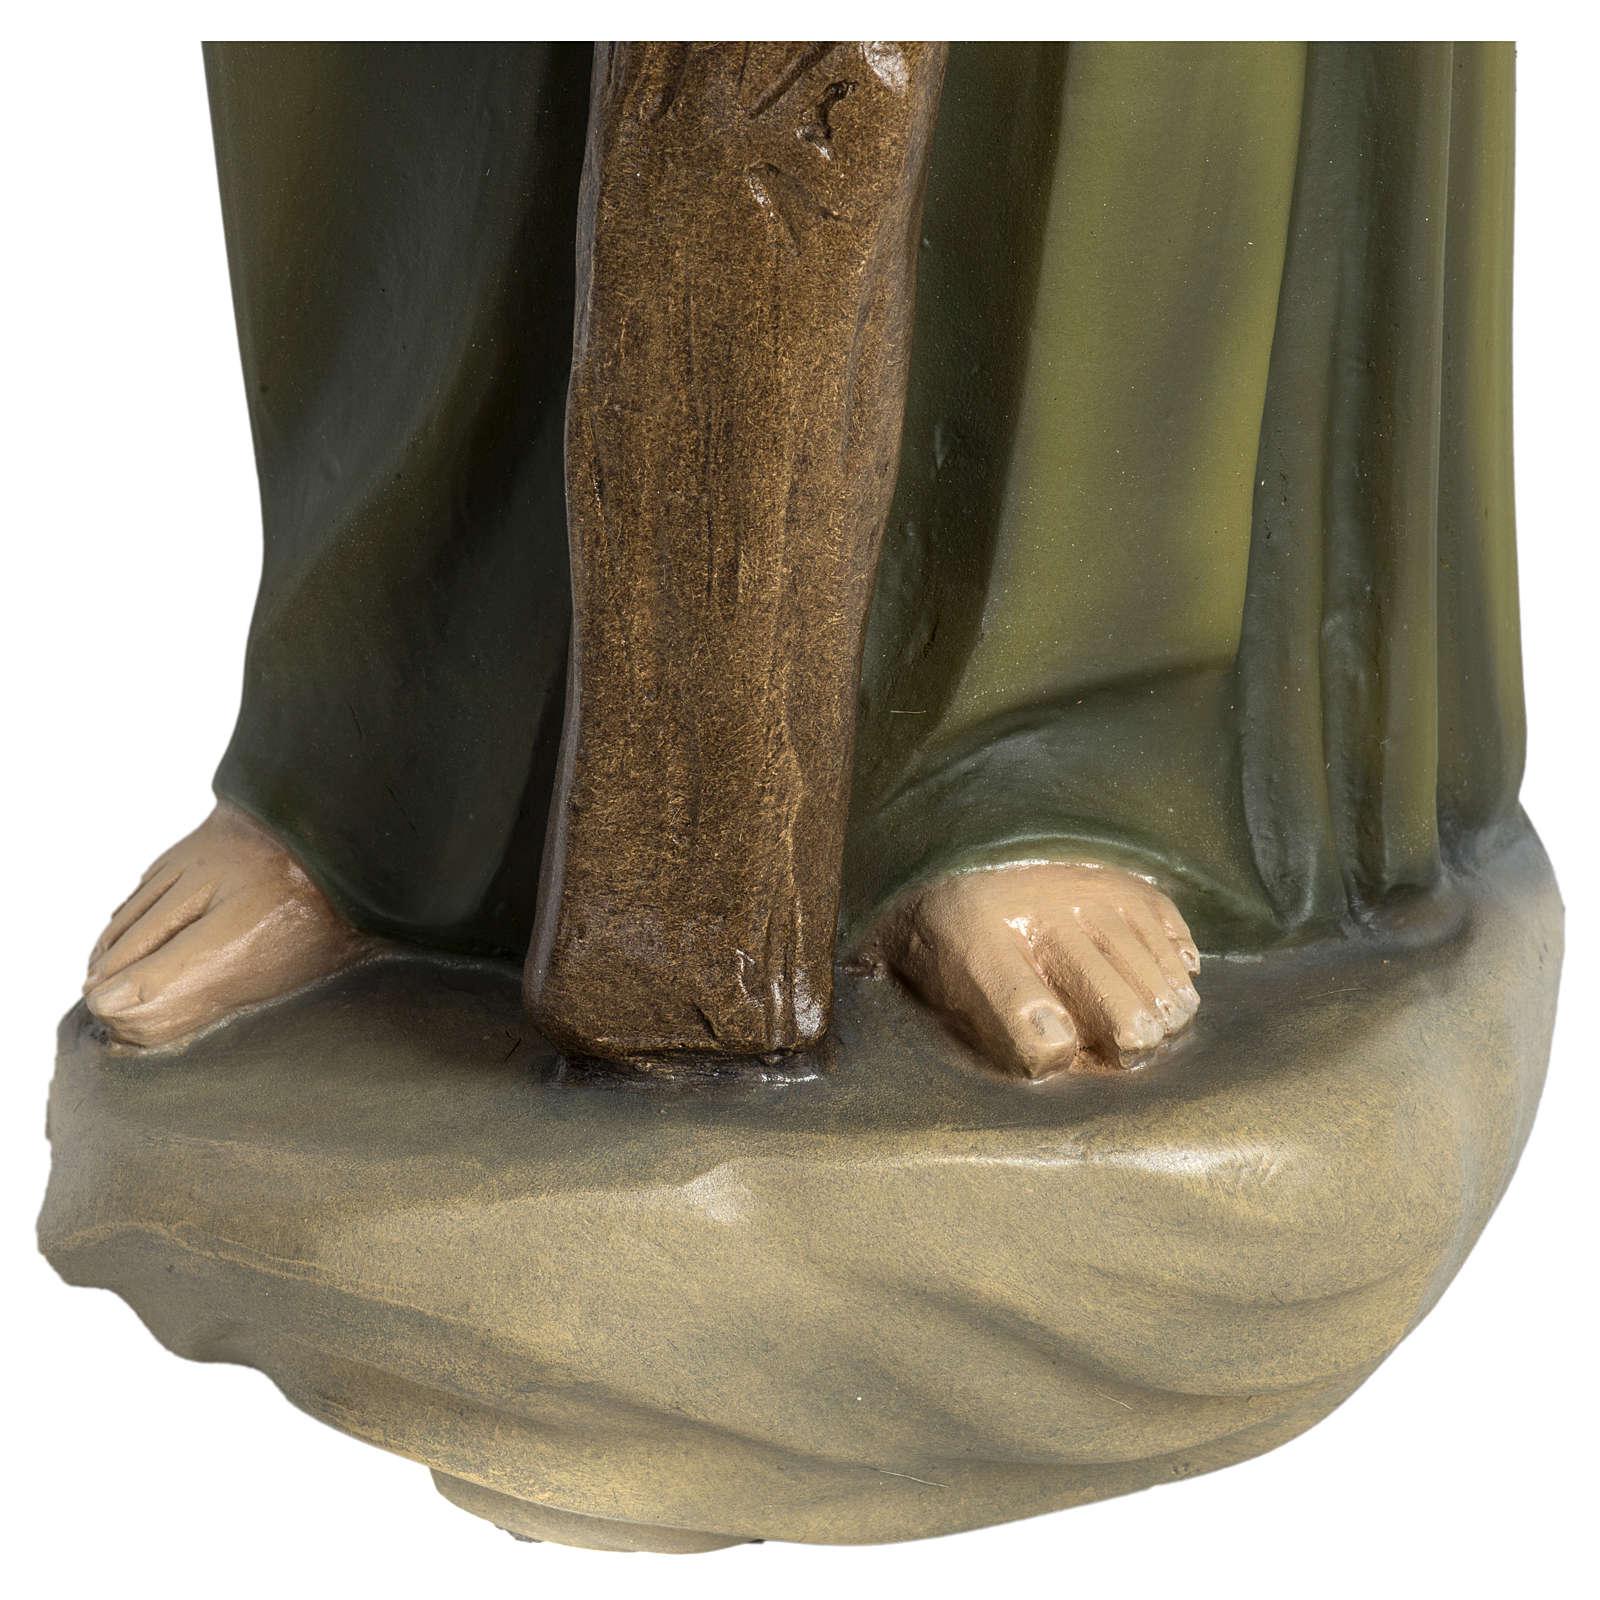 Statua Giuseppe falegname 60 cm applicazione vetroresina PER ESTERNO 4